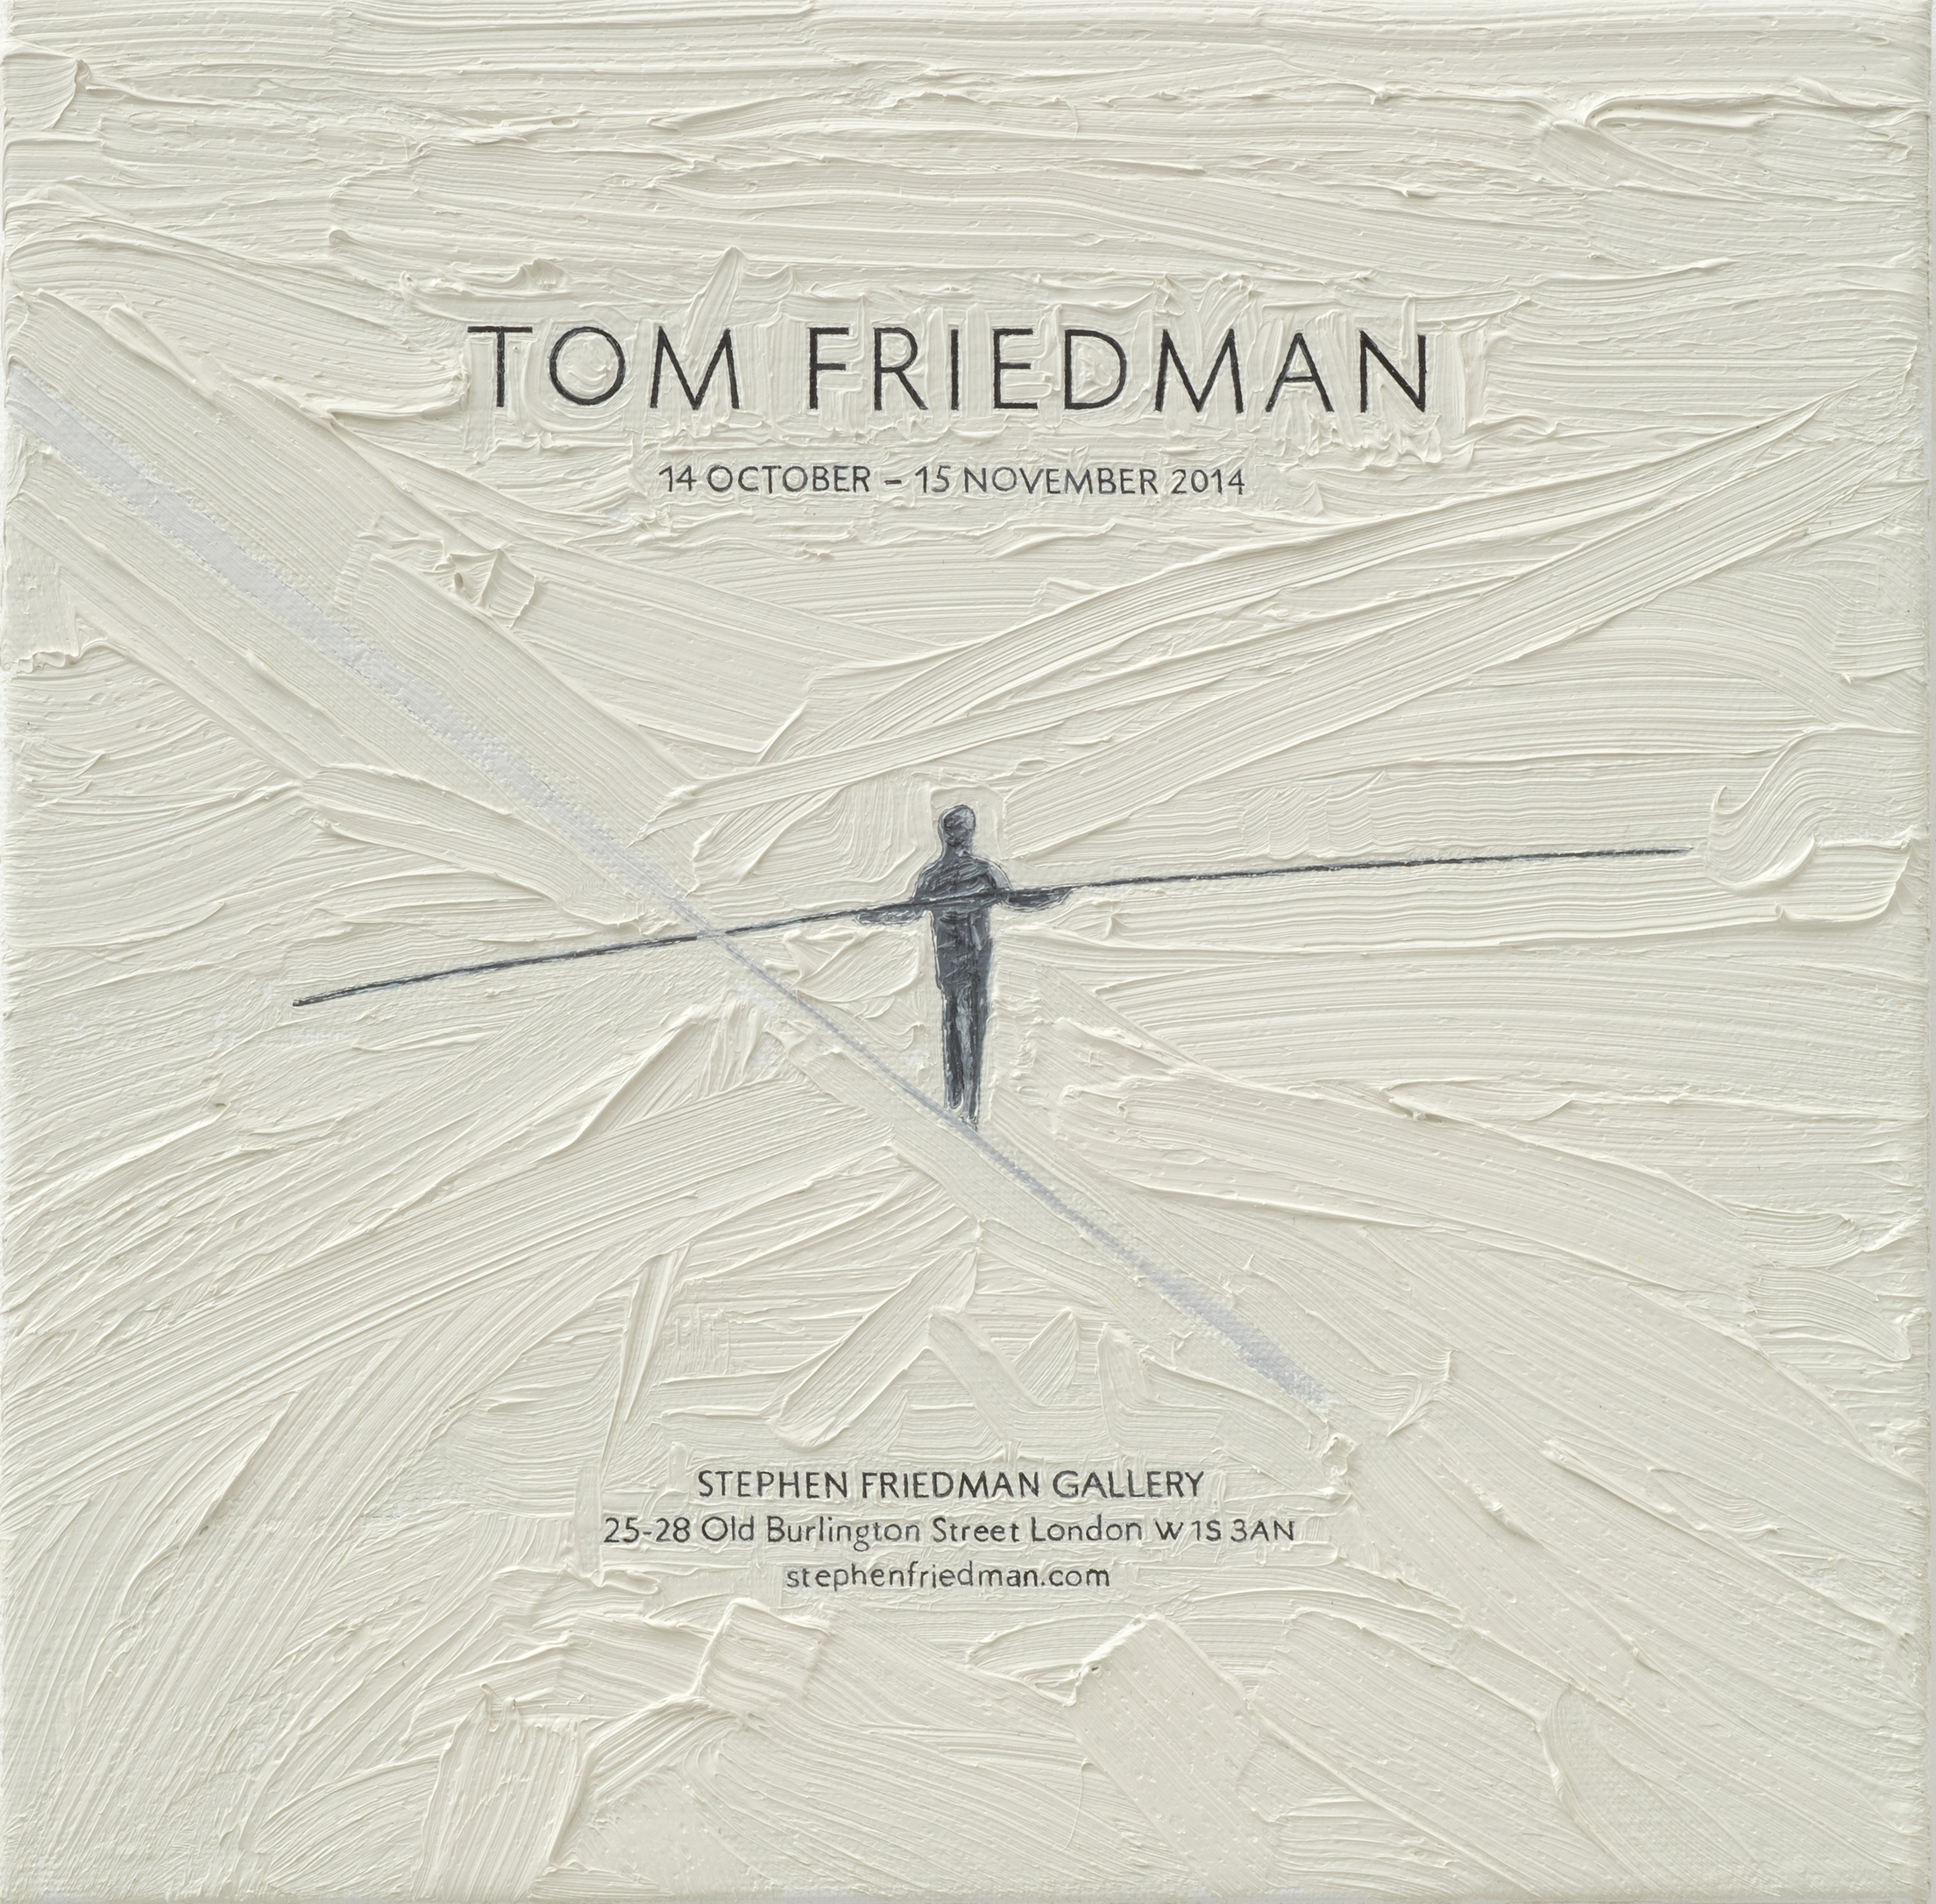 Tom Friedman at Stephen Friedman